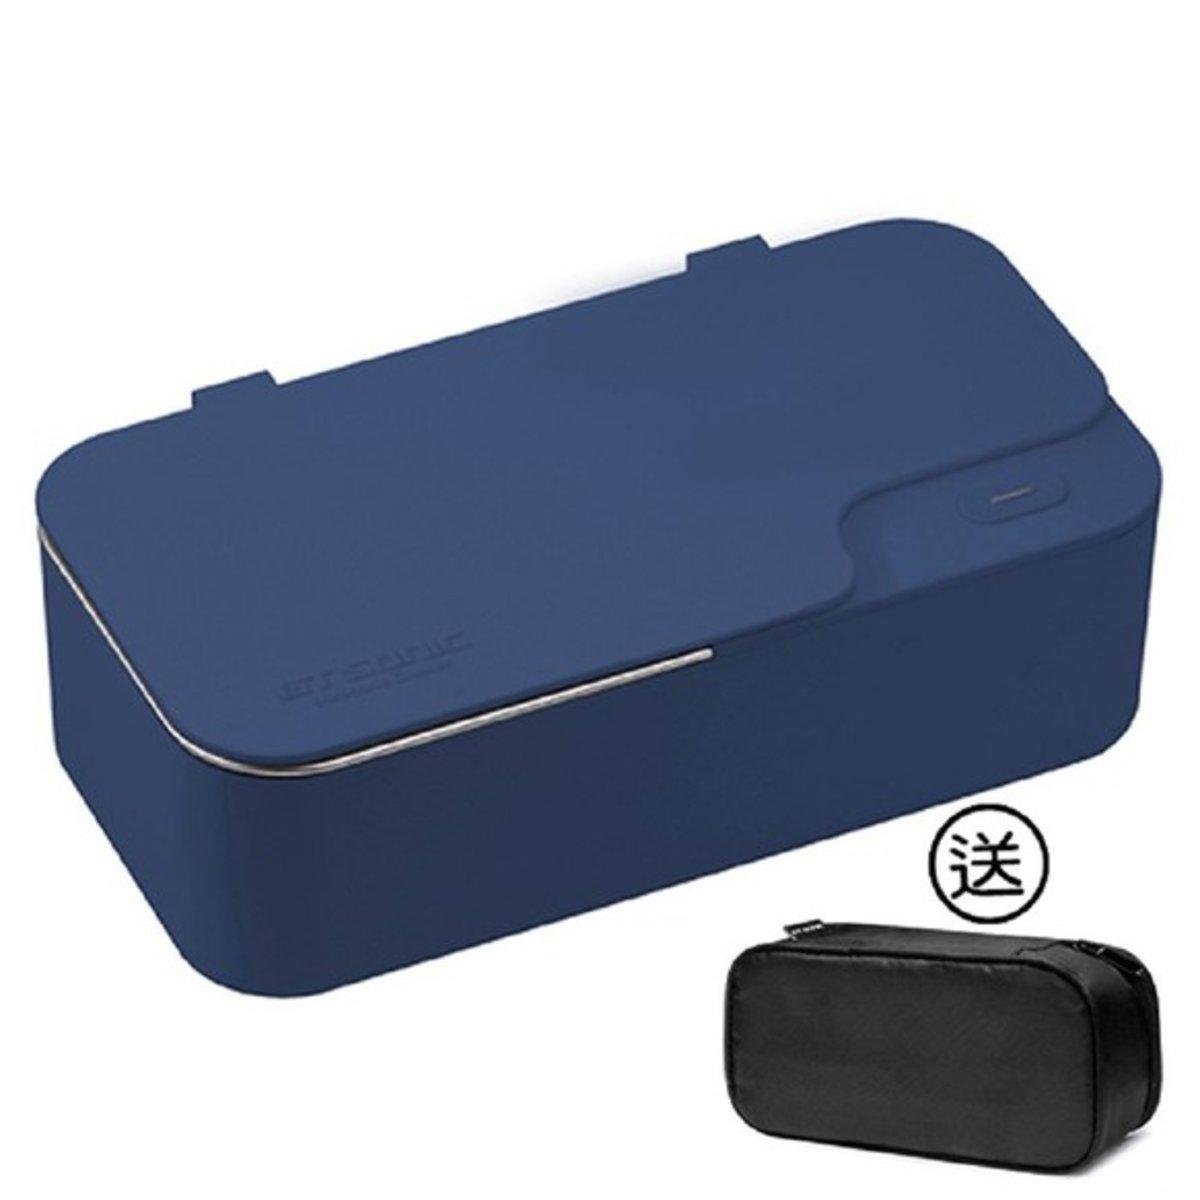 GT Sonic - X1超聲波 清洗機 眼鏡機 - 藍色 (香港行貨)